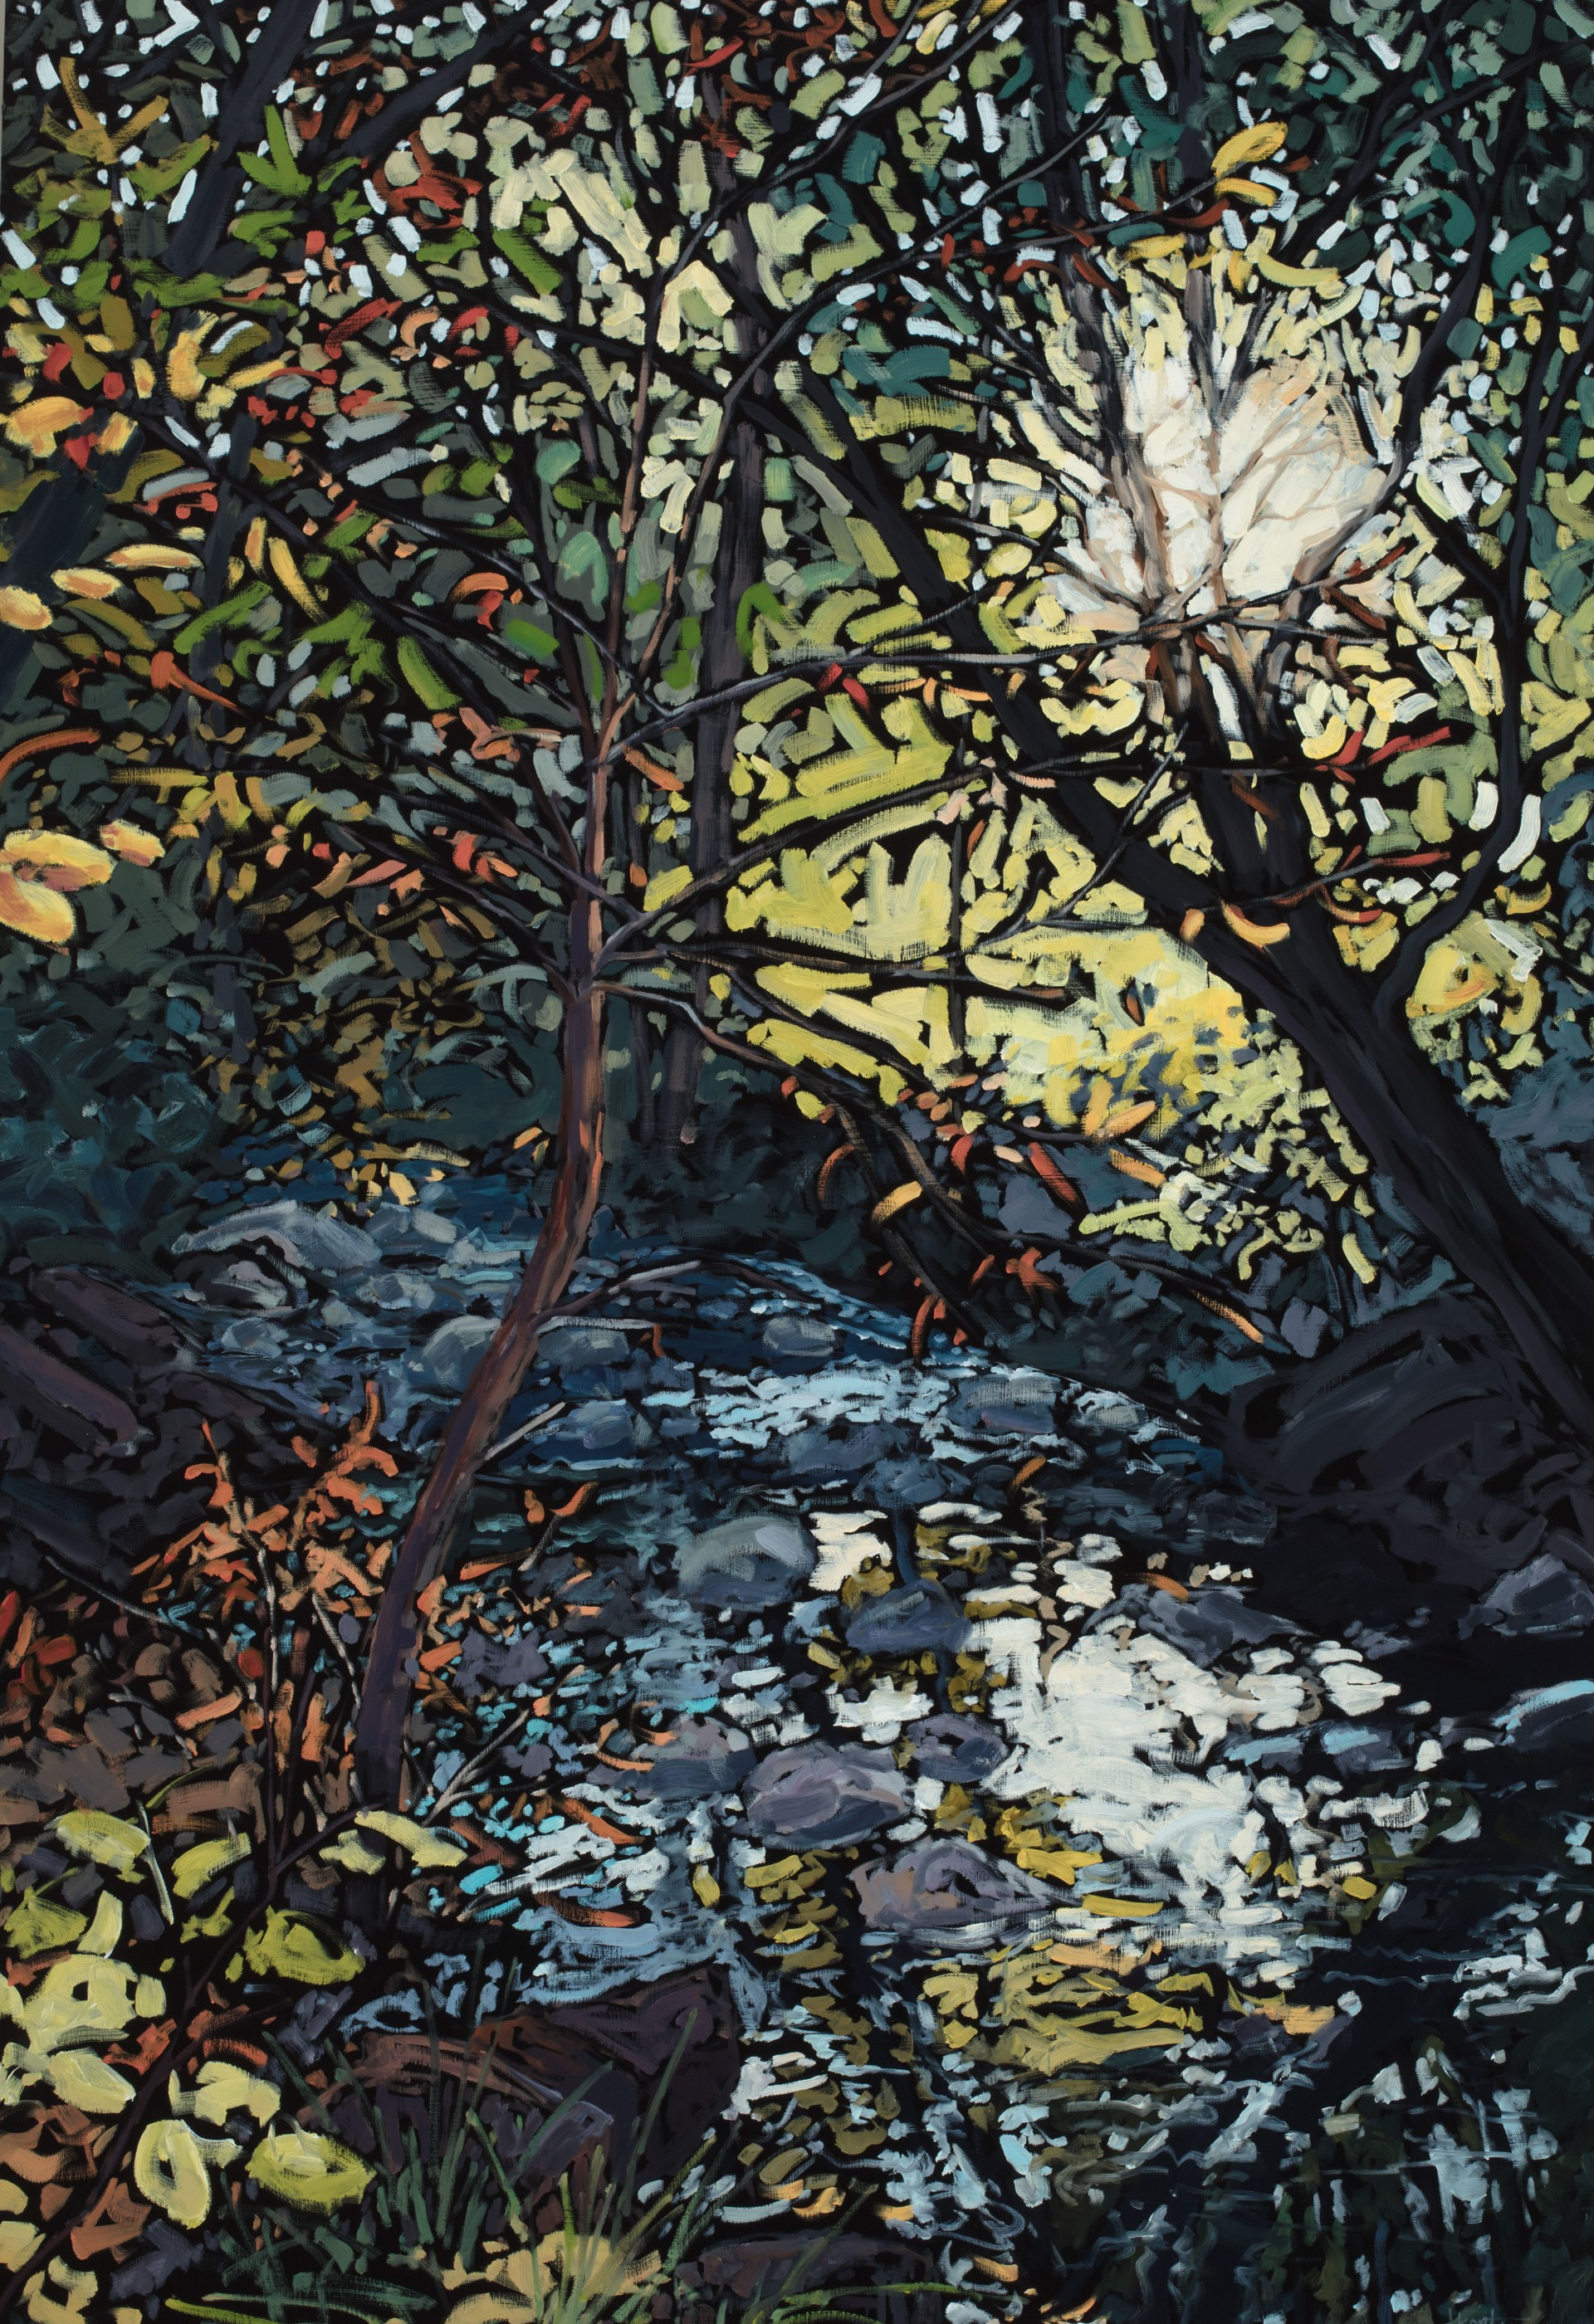 Reflecting on Seasons Past by Deb Komitor